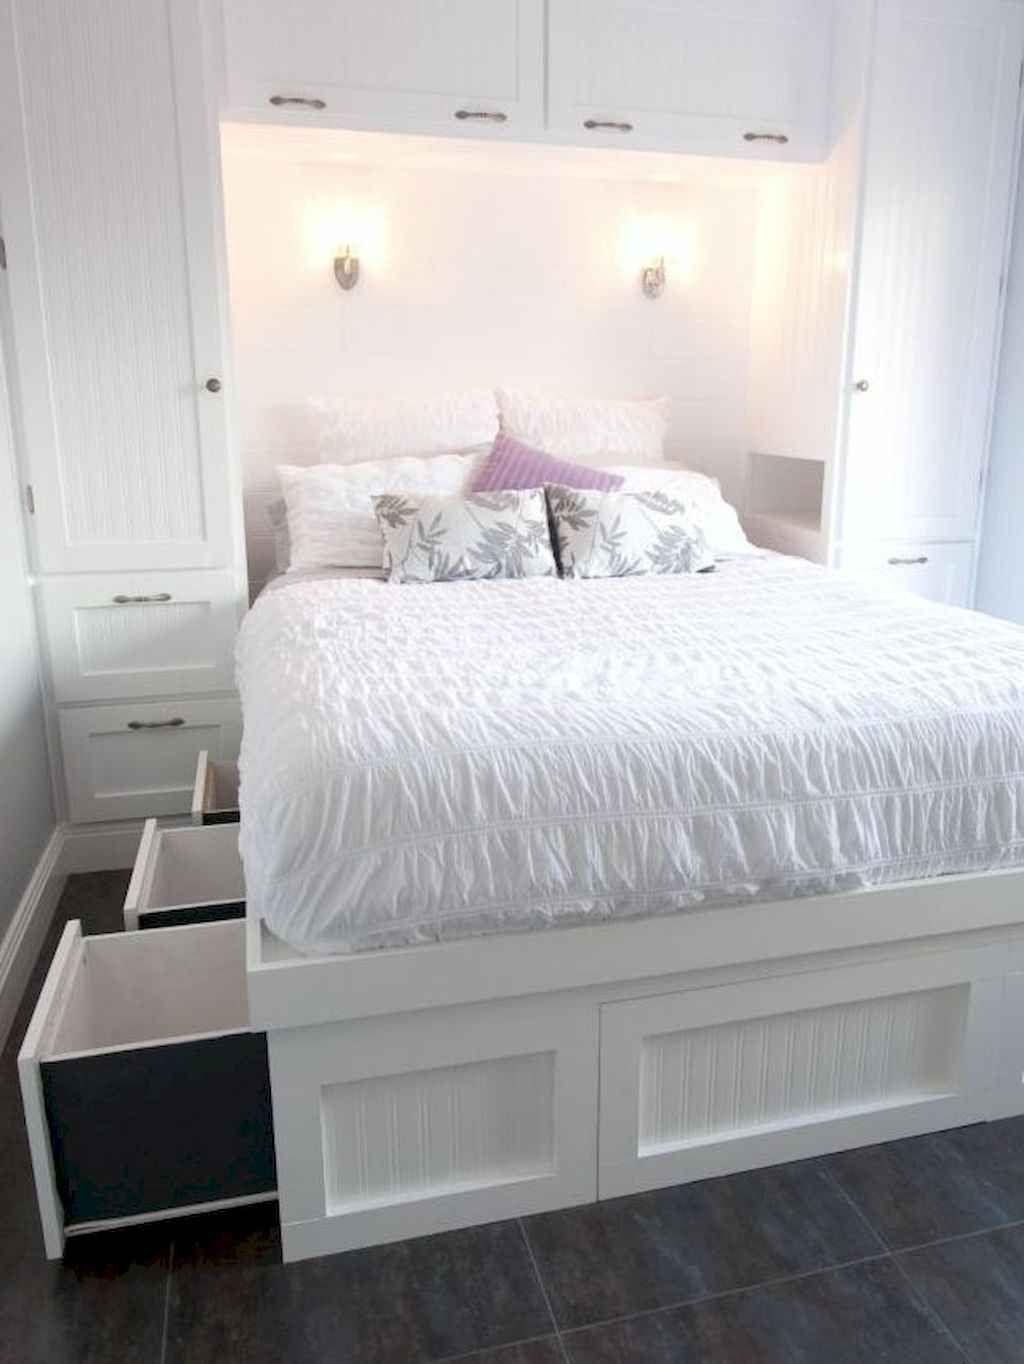 01 Cozy Small Master Bedroom Decorating Ideas - Decoradeas